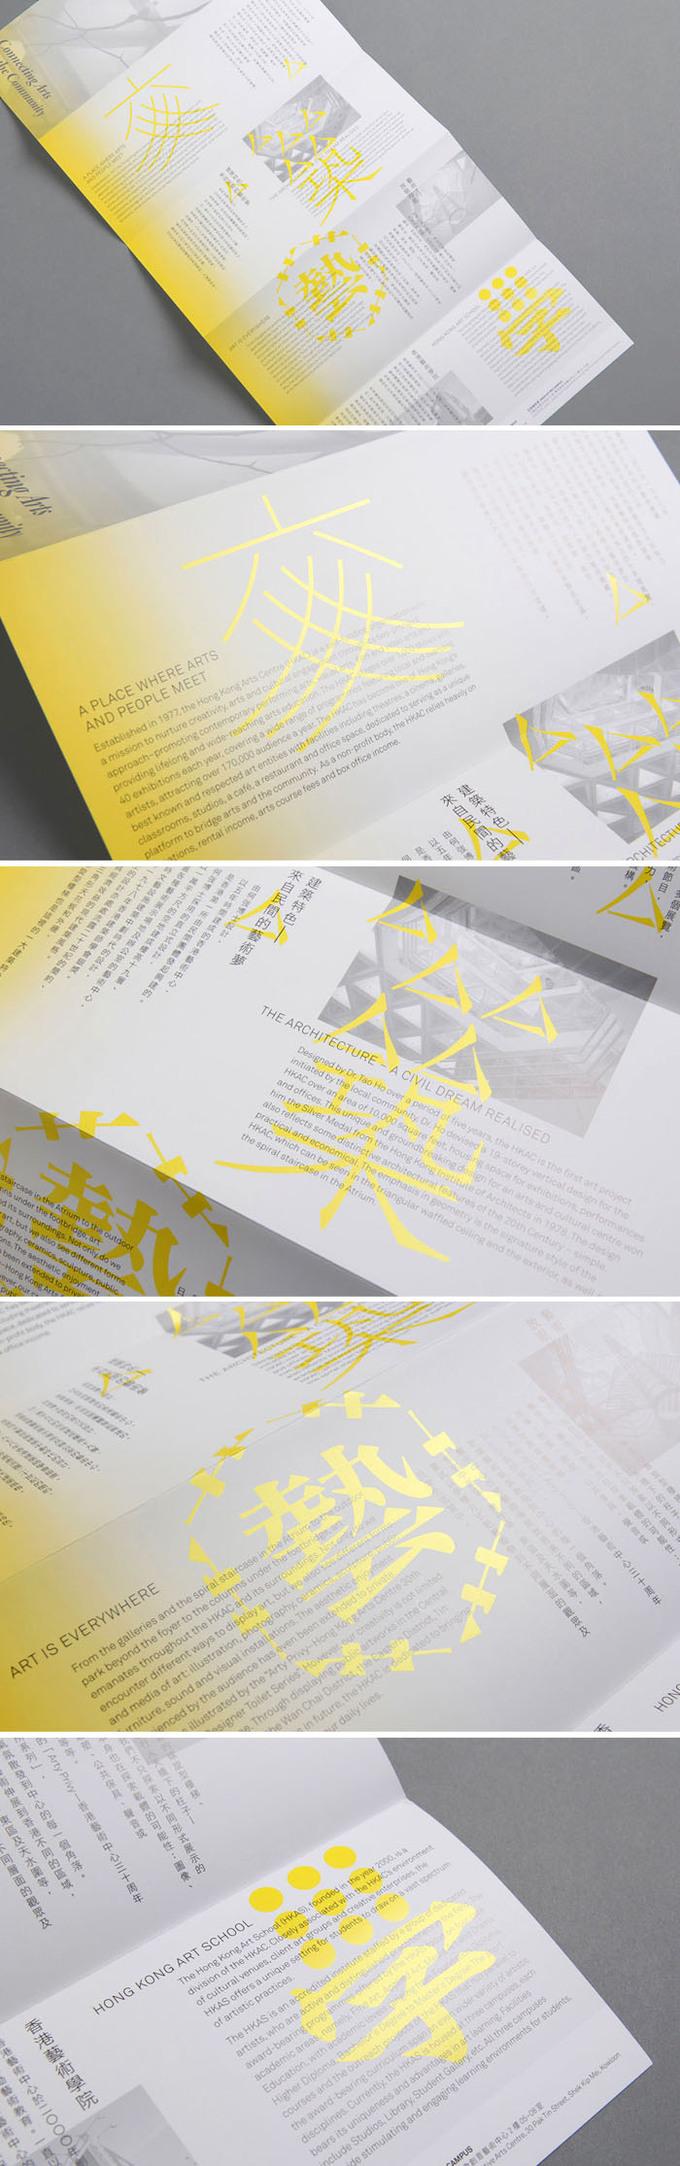 香港藝術中心 HKAC leaflet | Trilingua 叄語, 2011